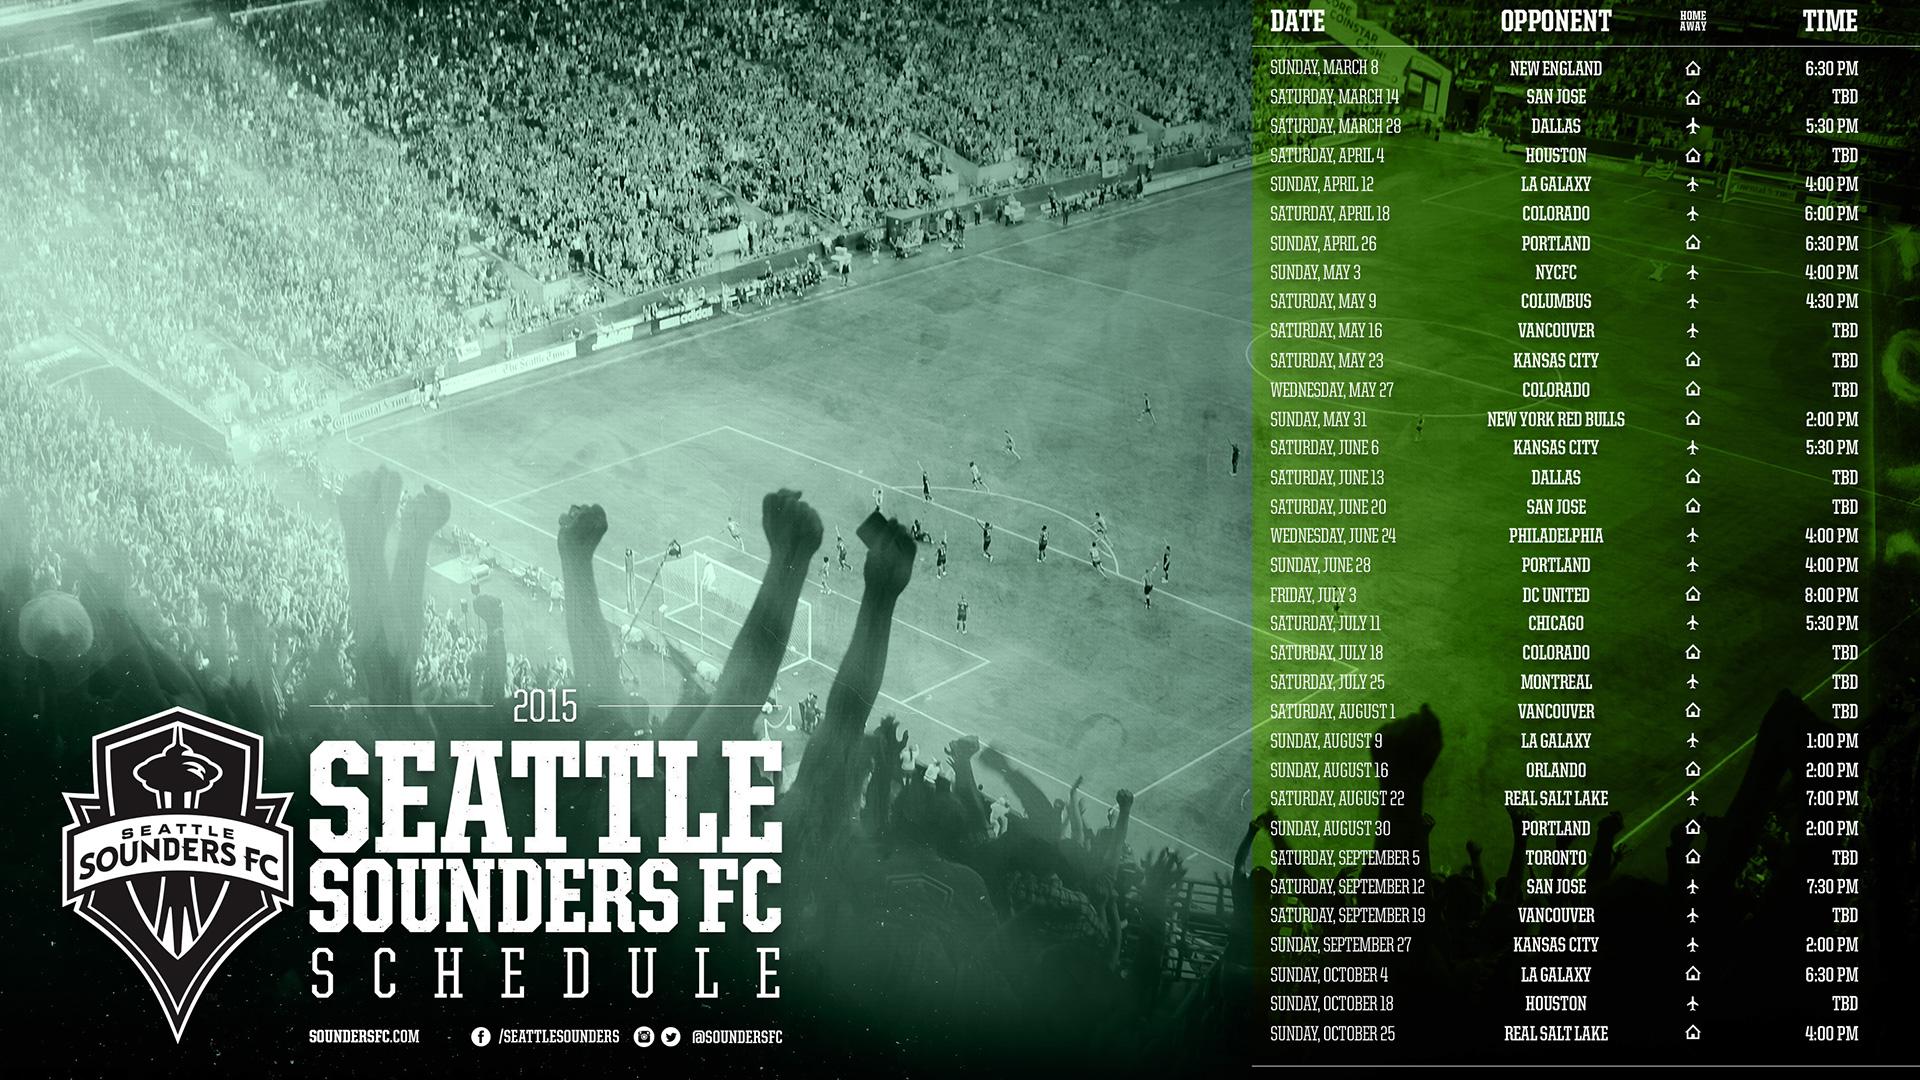 Sounders FC 2015 Schedule | Seattle Sounders FC